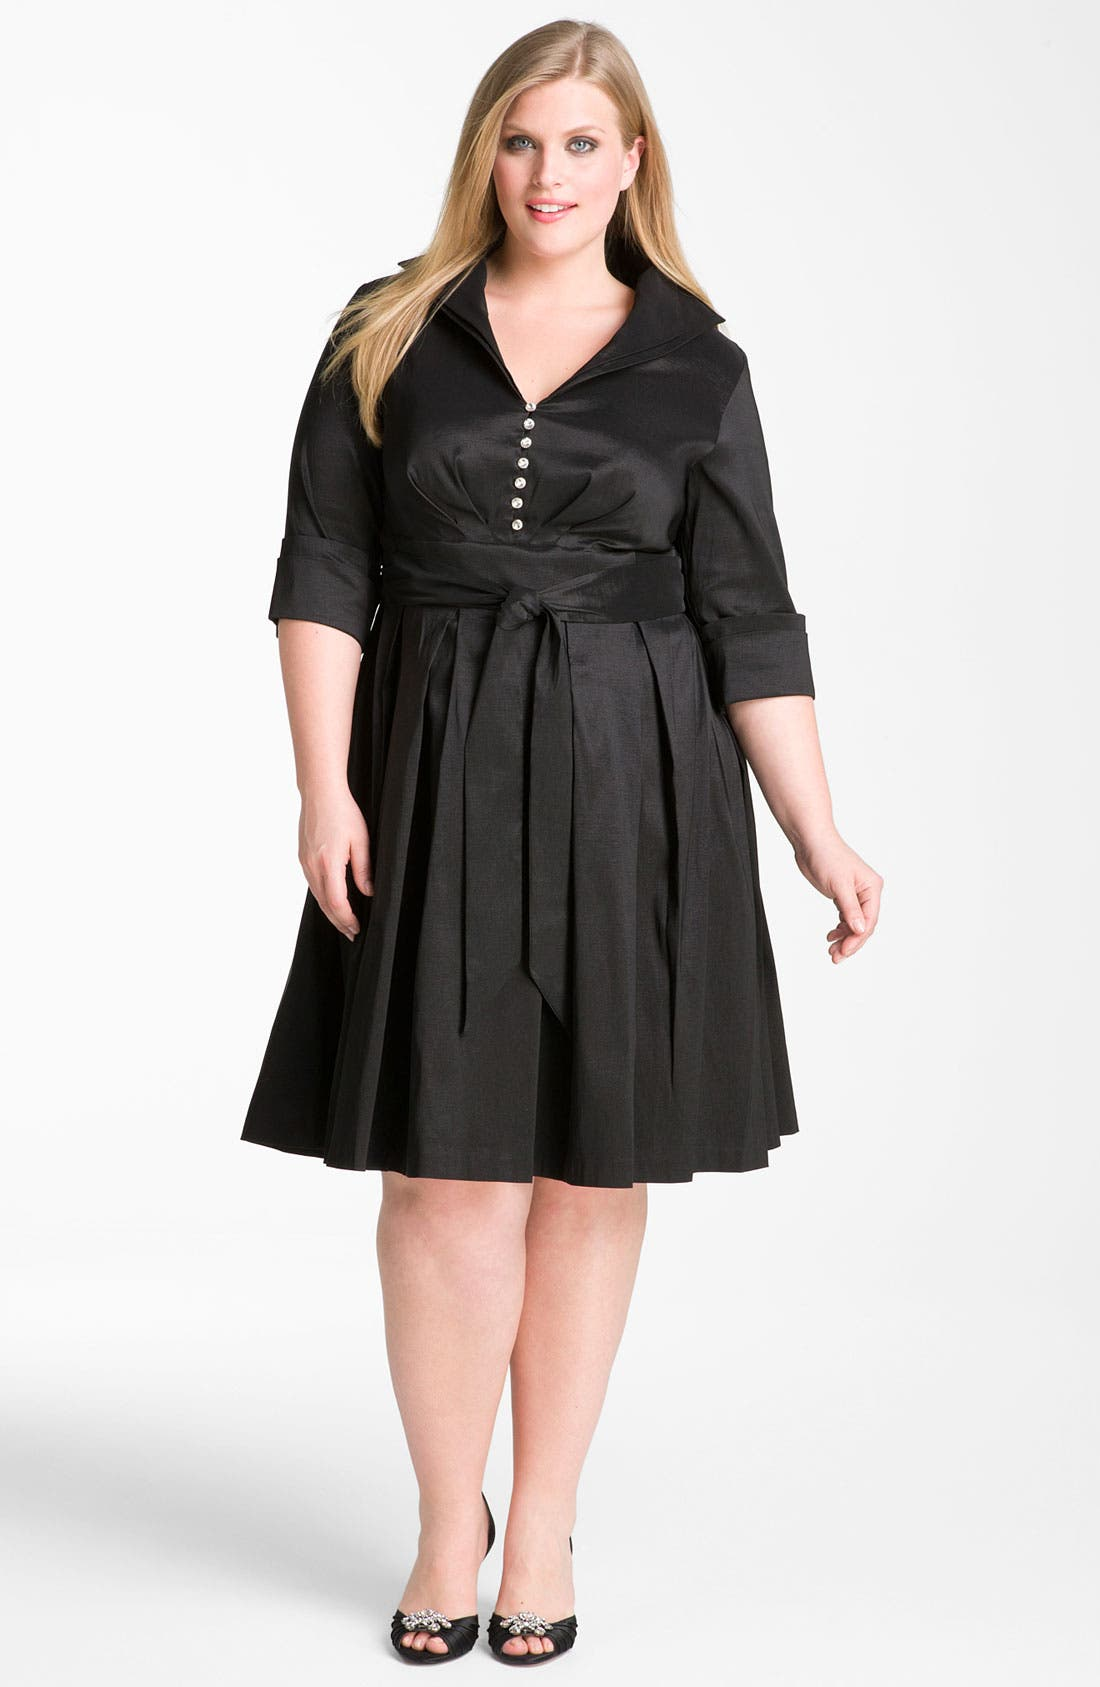 Alternate Image 1 Selected - Donna Ricco Rhinestone Button Taffeta Shirtdress (Plus Size)